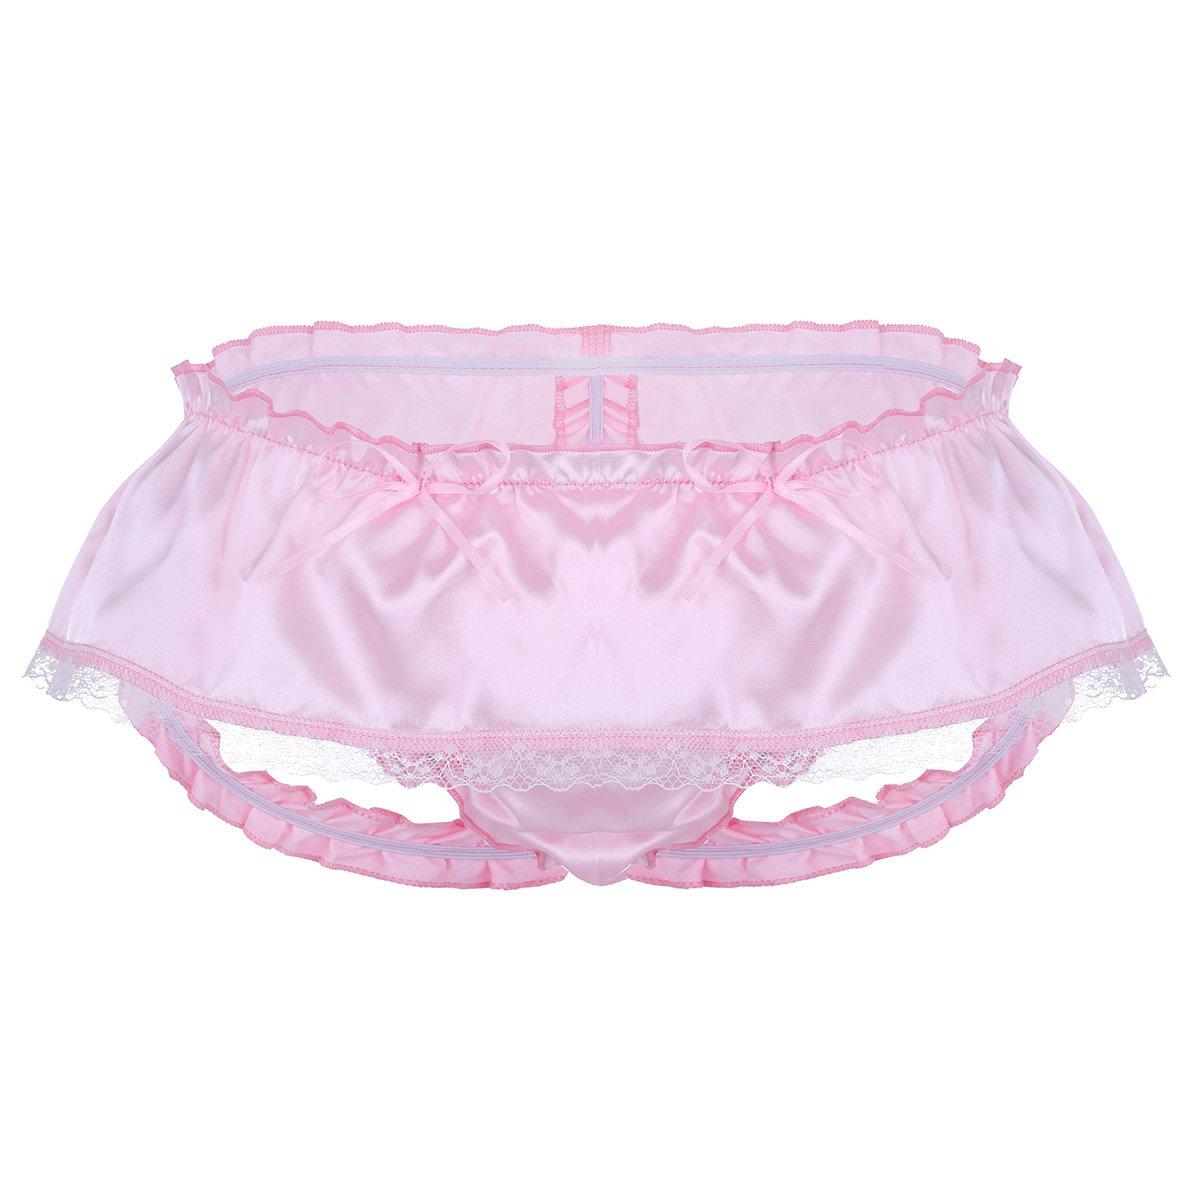 d66ecb77731 Top 10 wholesale Mens Exotic Thongs - Chinabrands.com